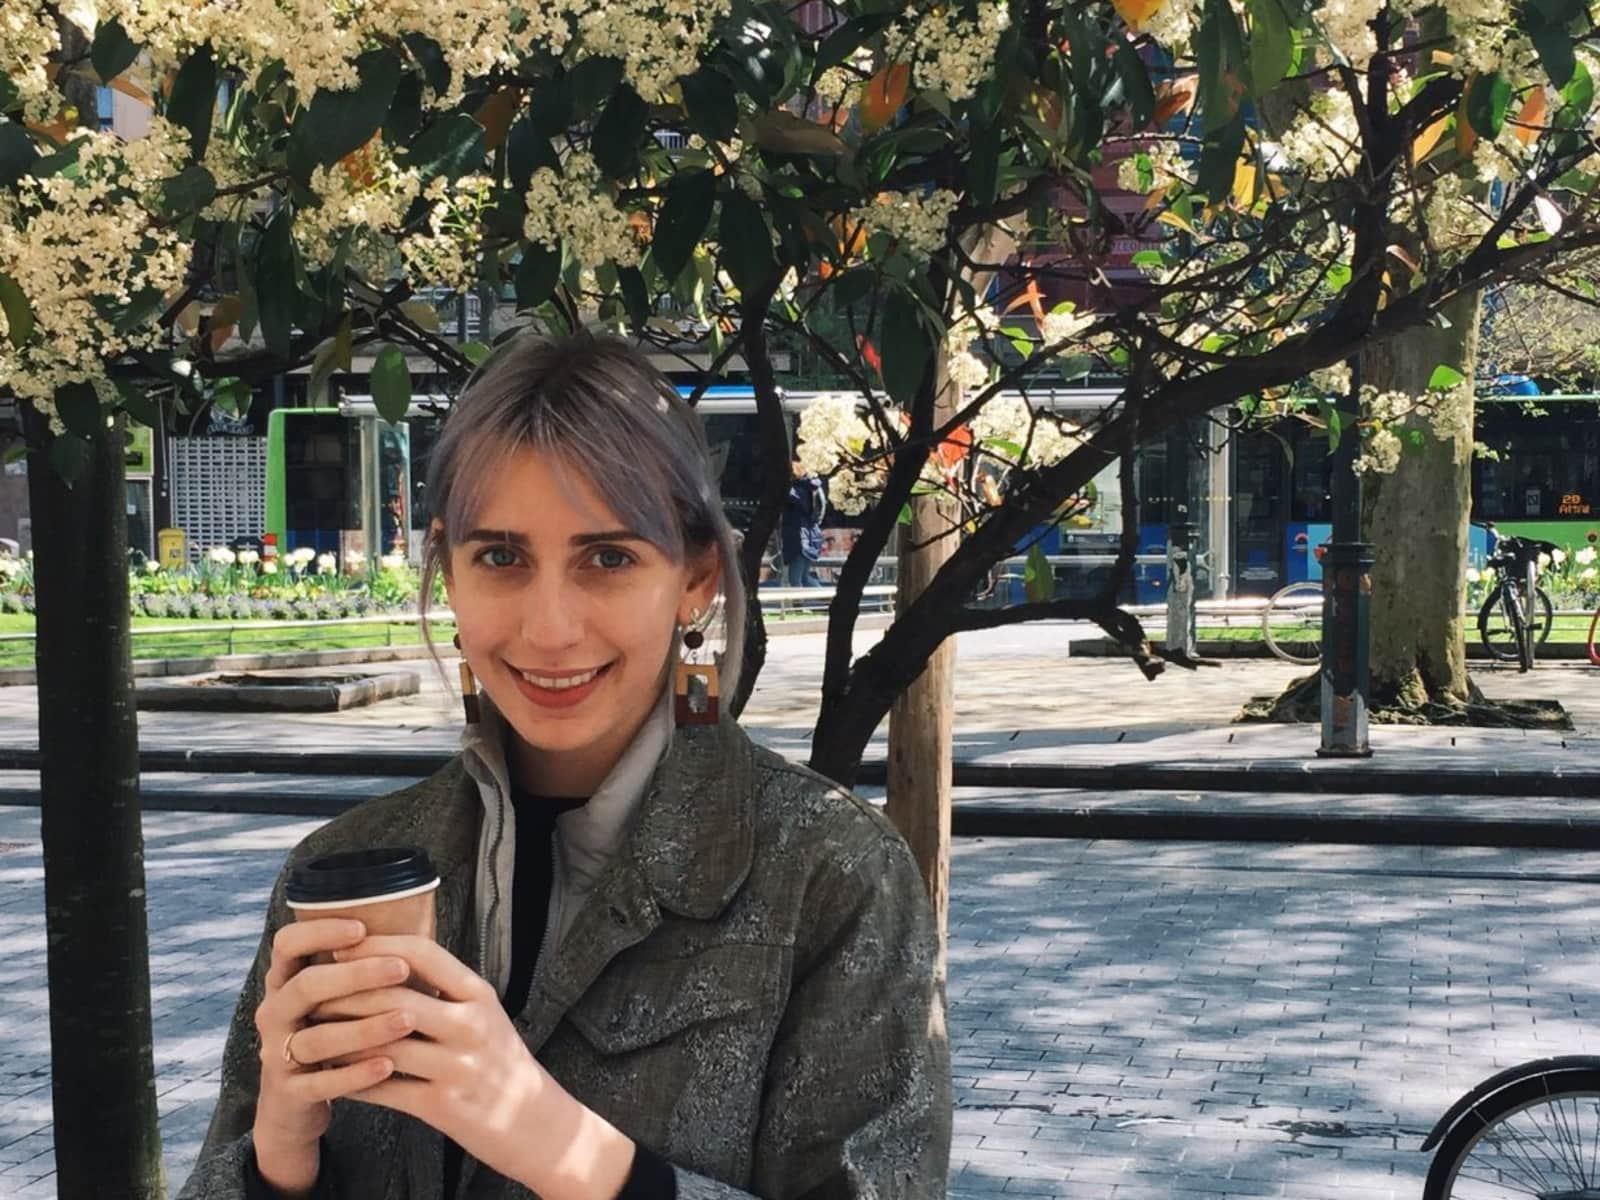 Dana from City of London, United Kingdom